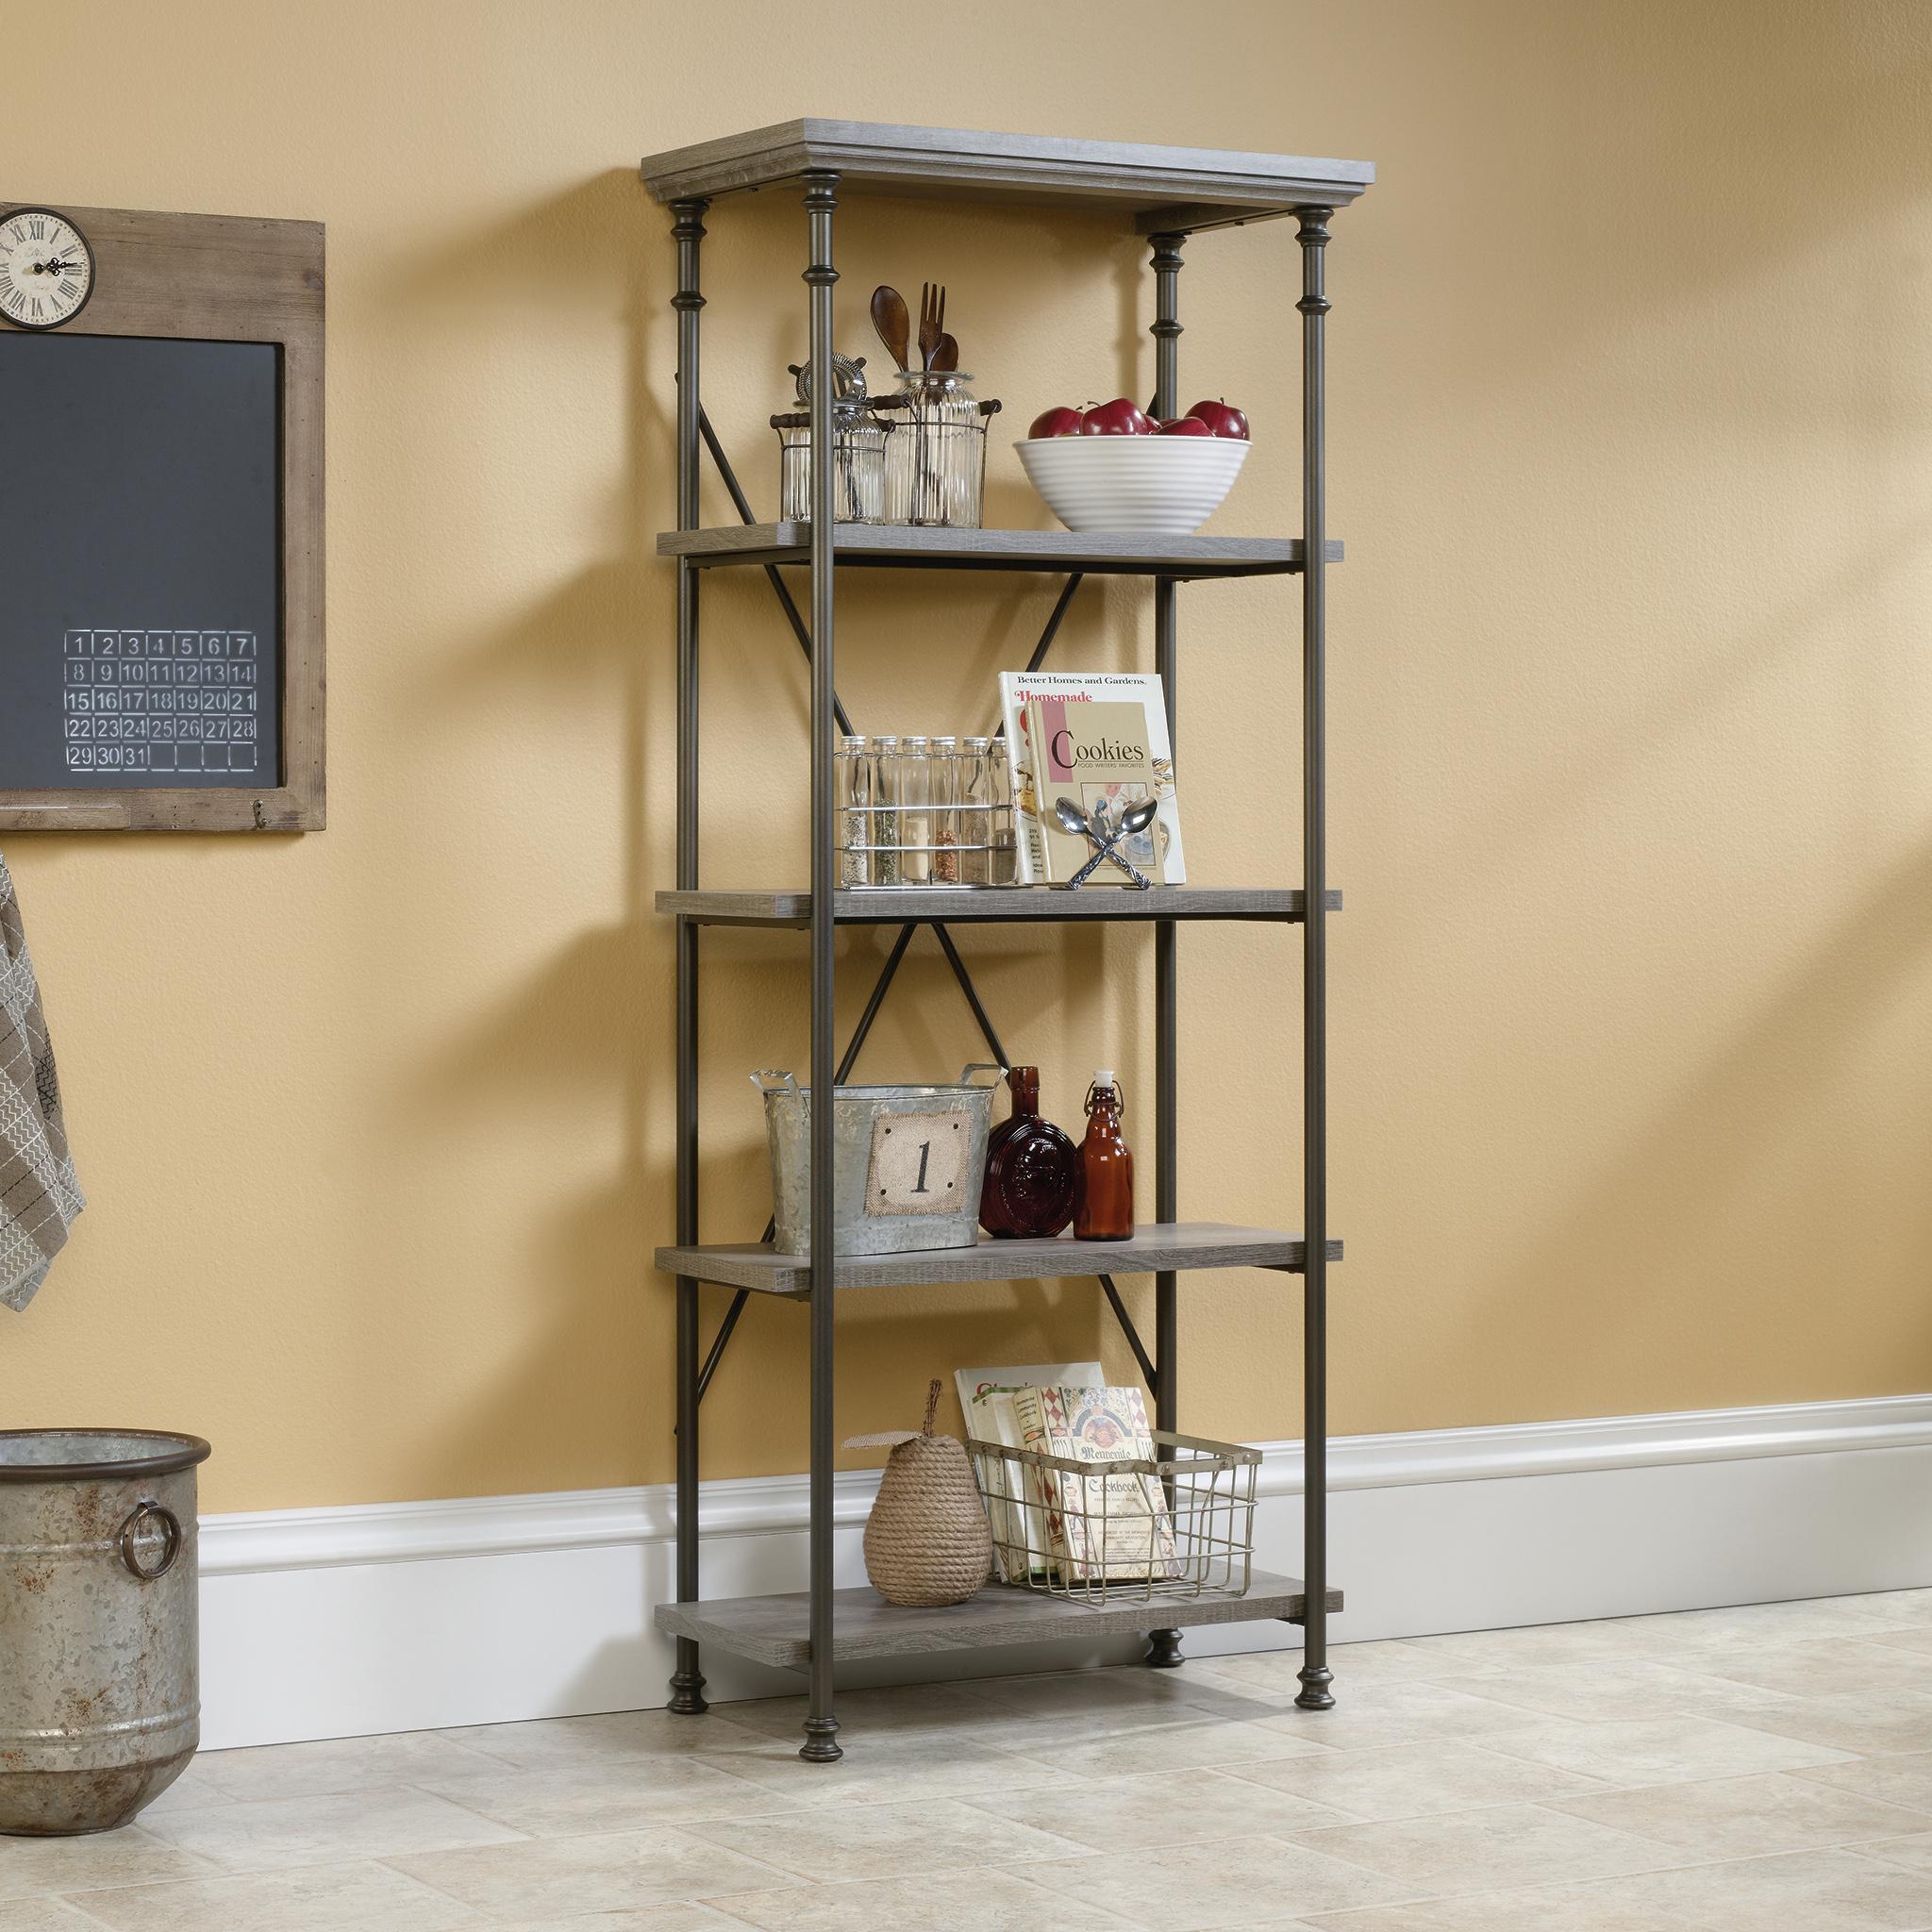 Industrial Style 4 Shelf Bookcase (Charter Oak Finish)